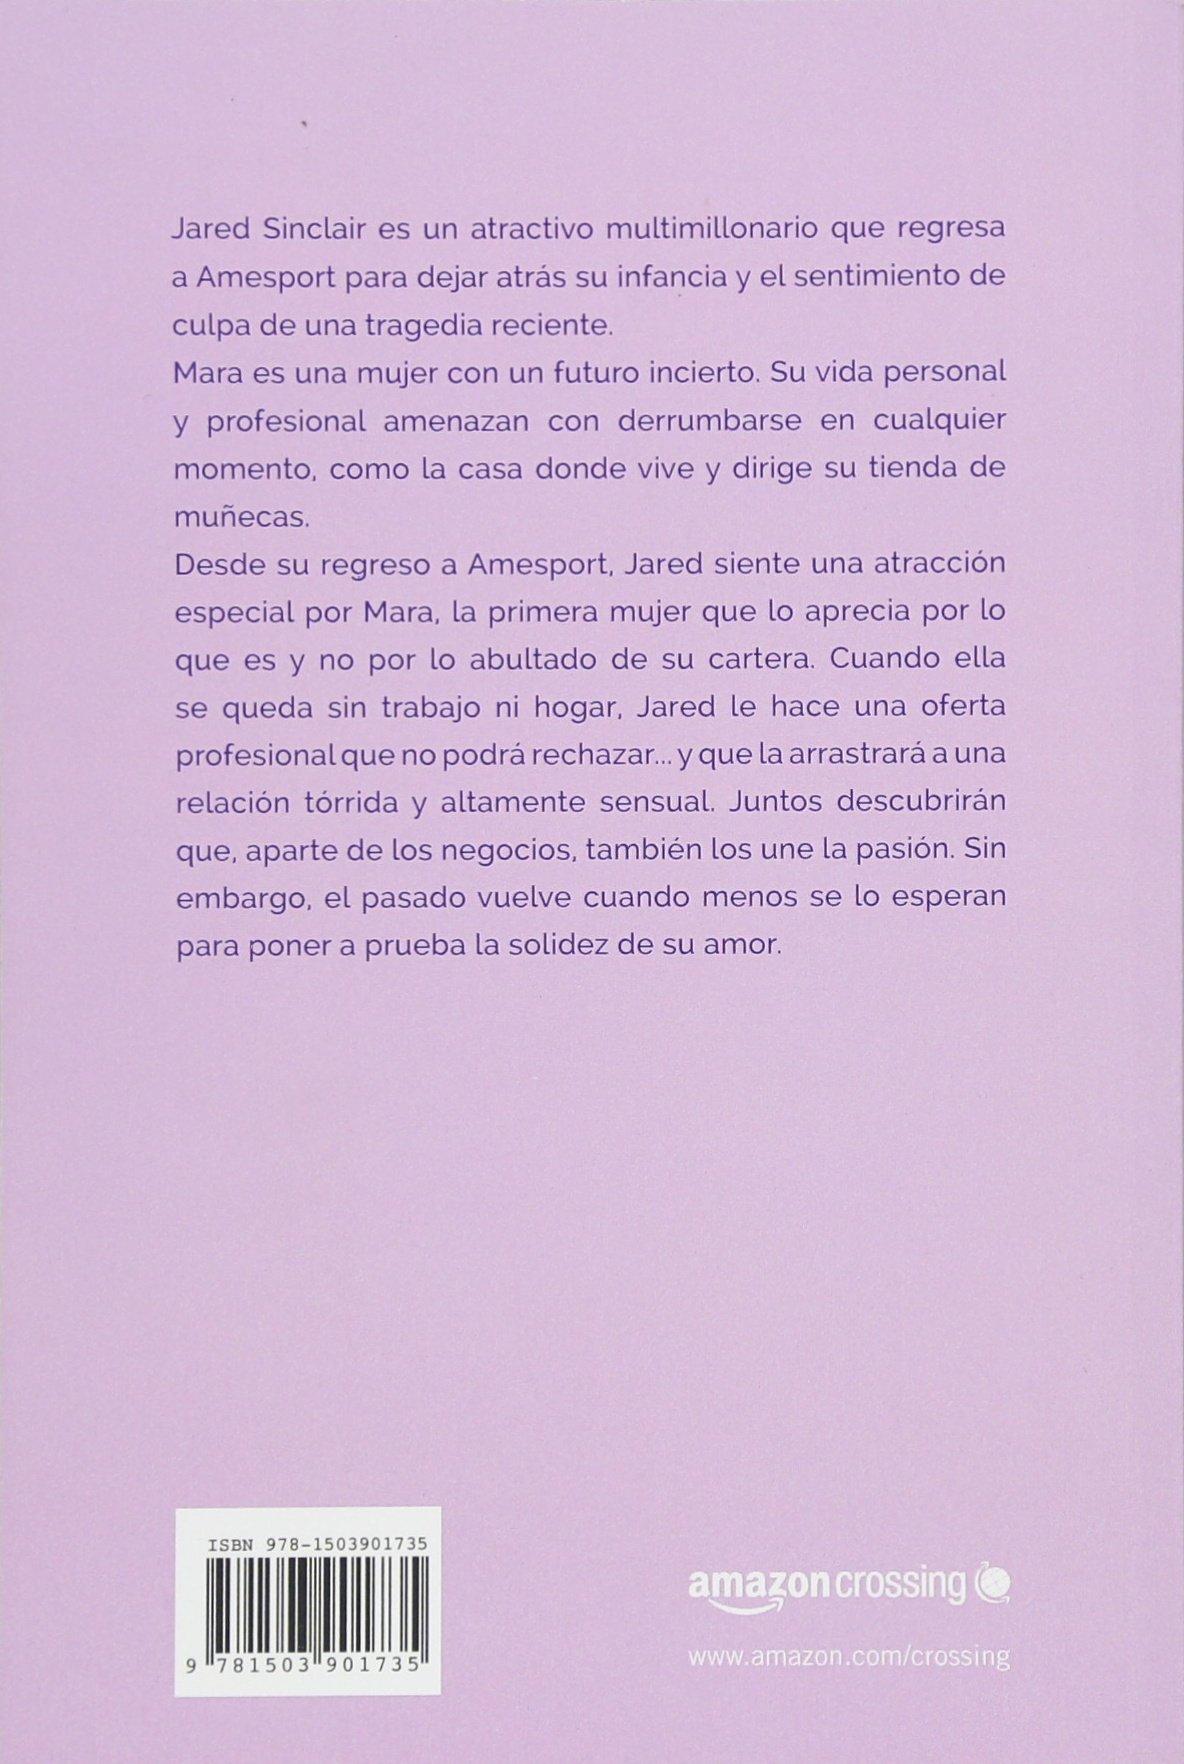 Amazon.com: El multimillonario prohibido (Los Sinclair) (Spanish Edition)  (9781503901735): J. S. Scott, Roberto Falcó Miramontes: Books